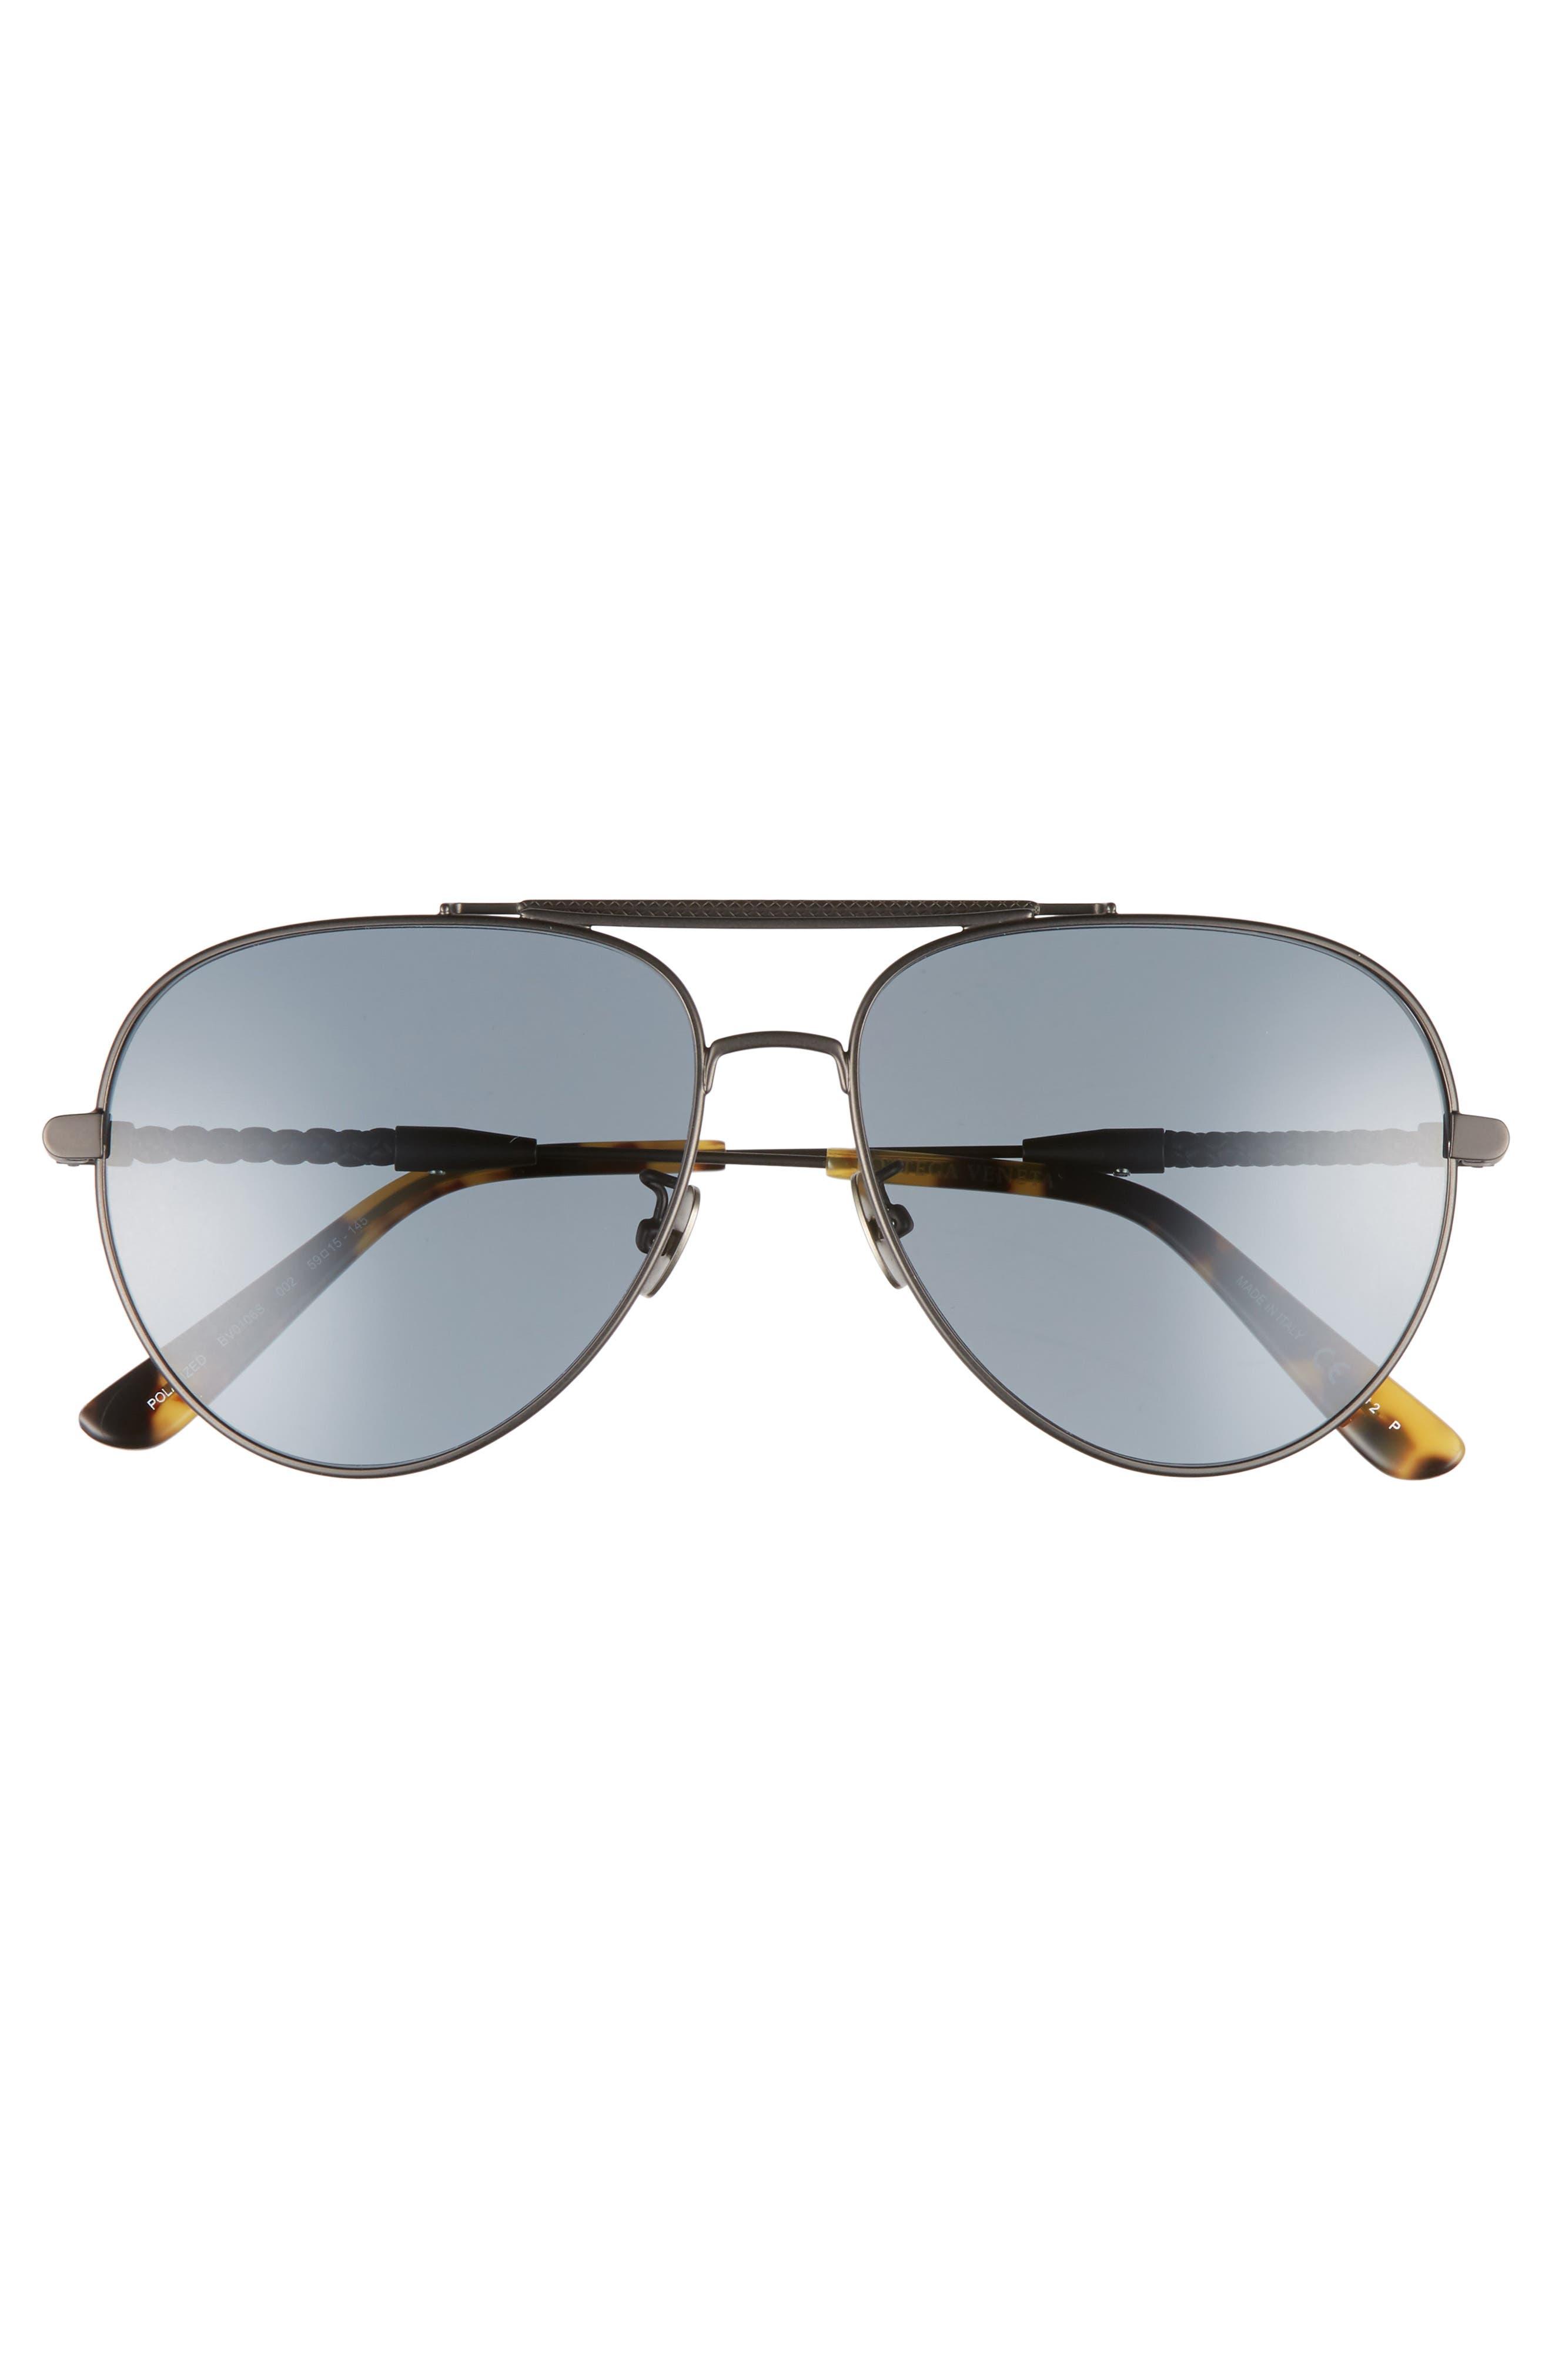 59m Polarized Aviator Sunglasses,                             Alternate thumbnail 3, color,                             Ruthenium